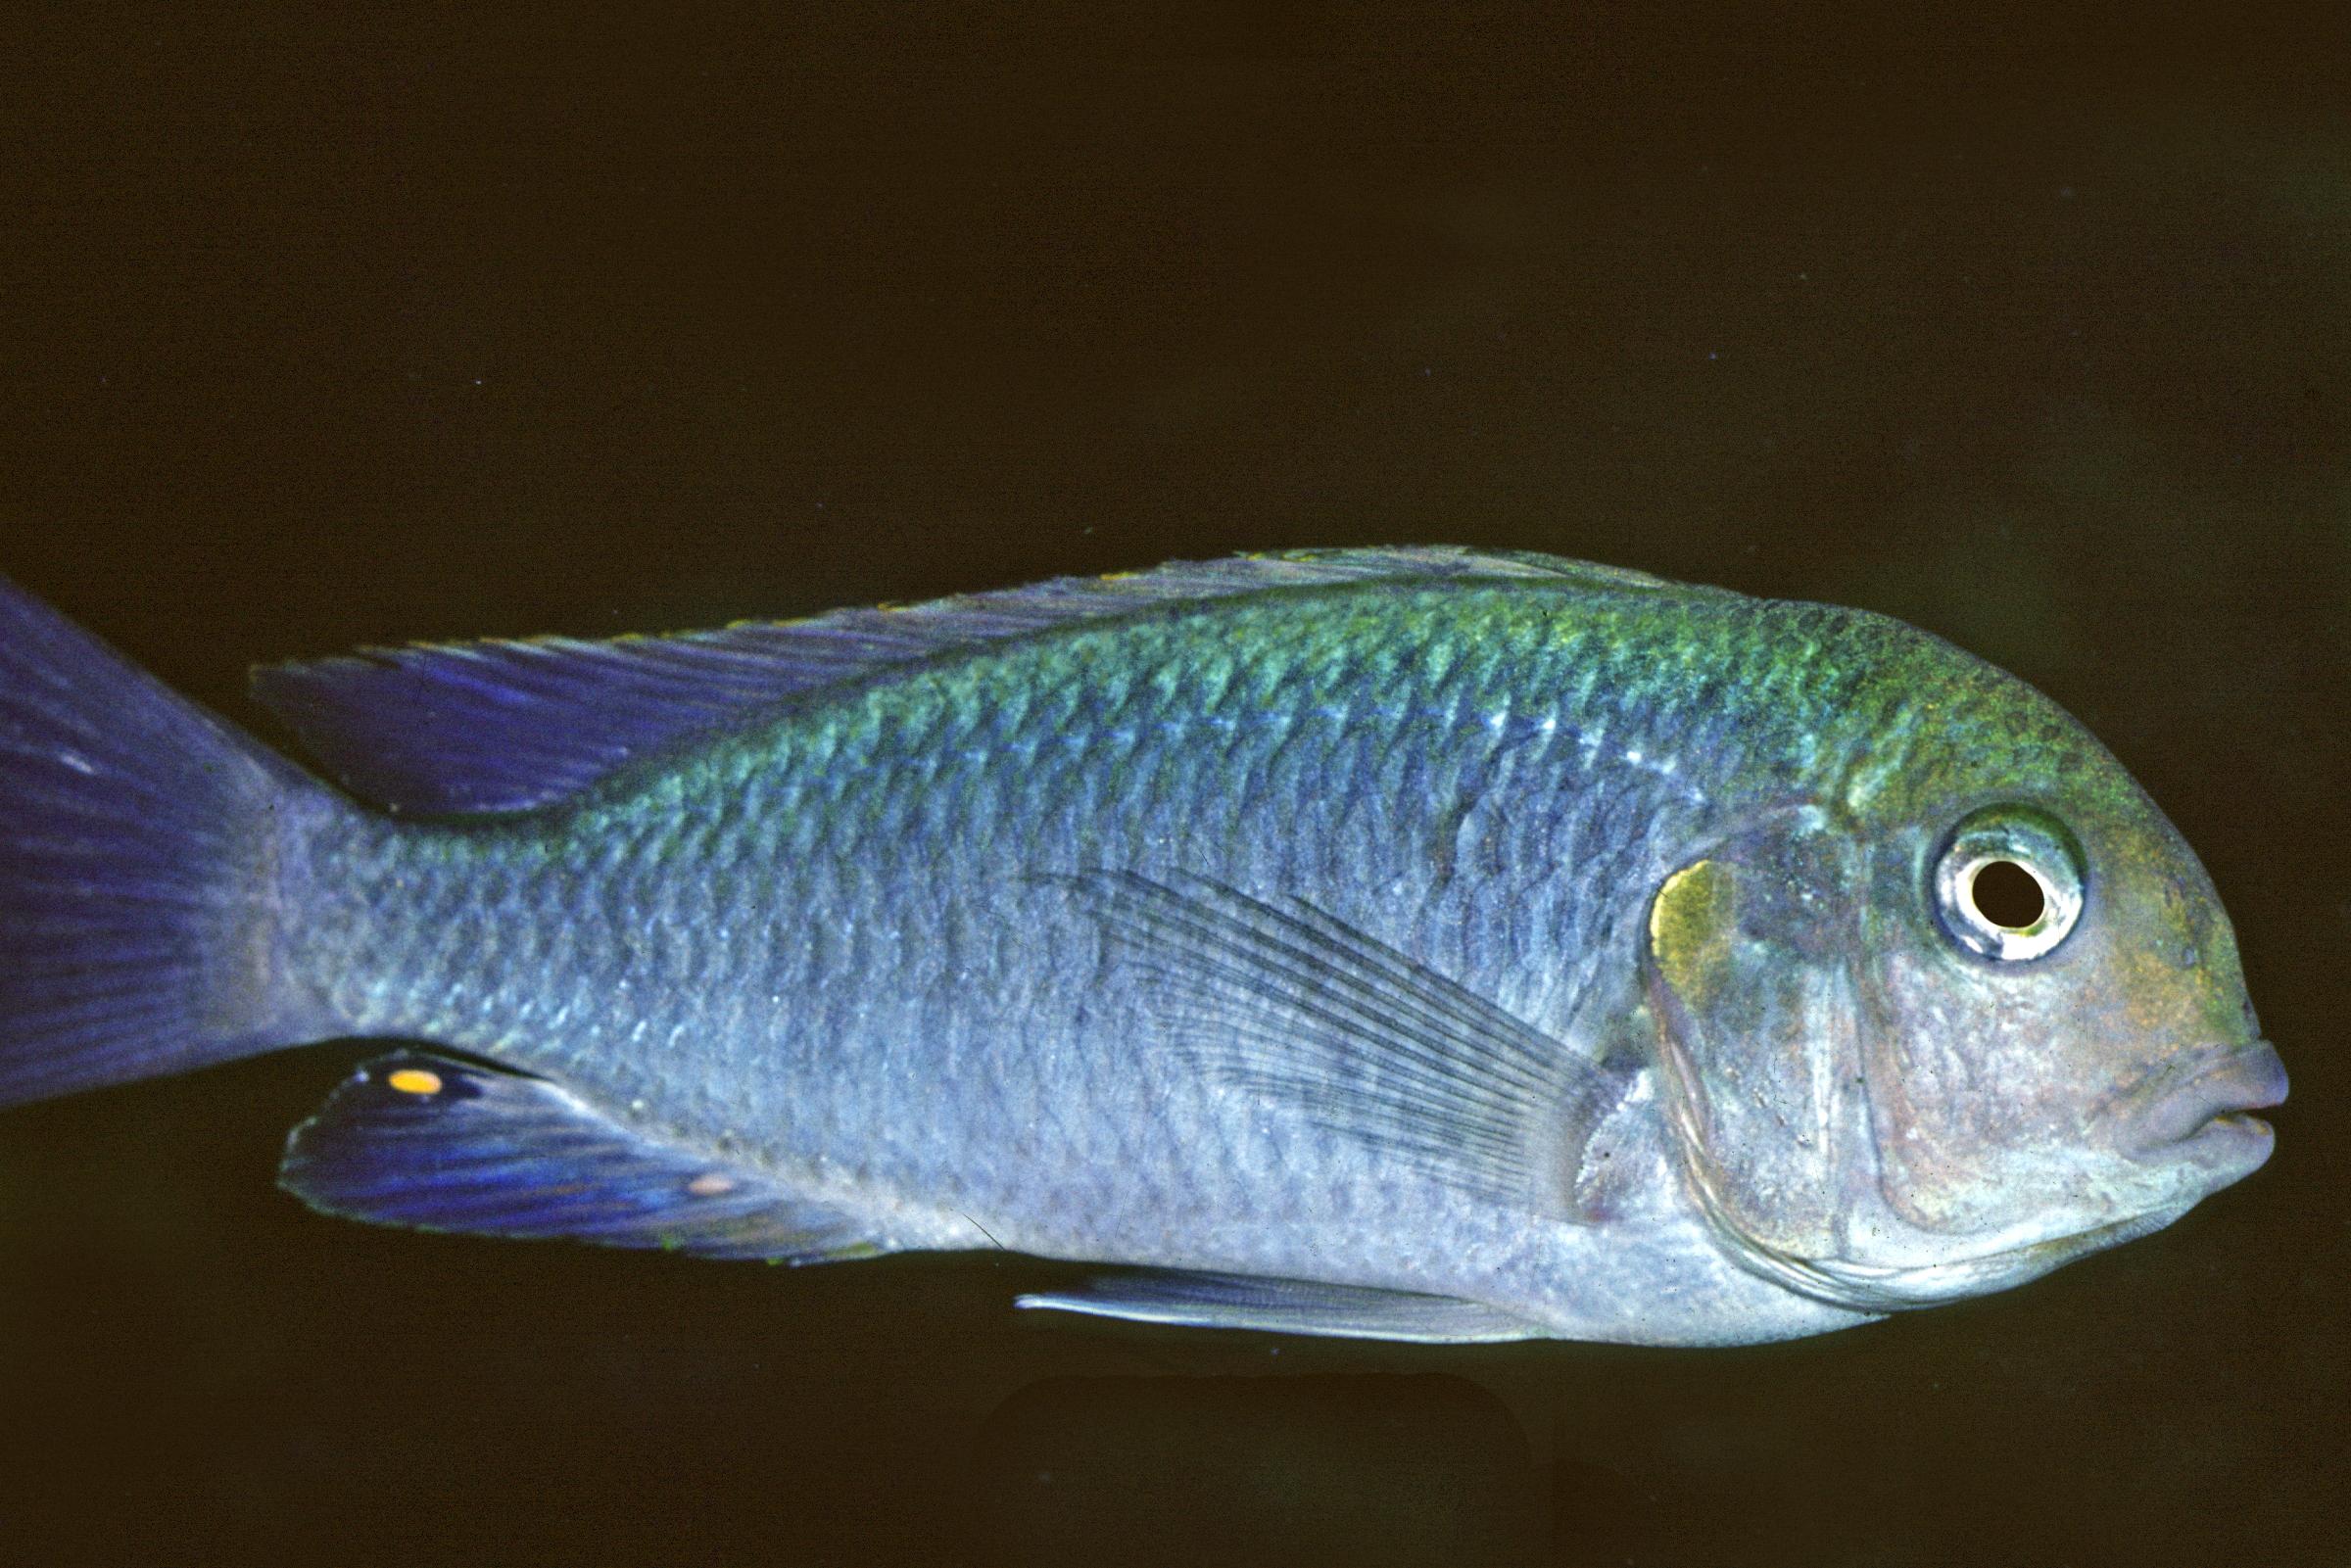 Pseudosimochromis